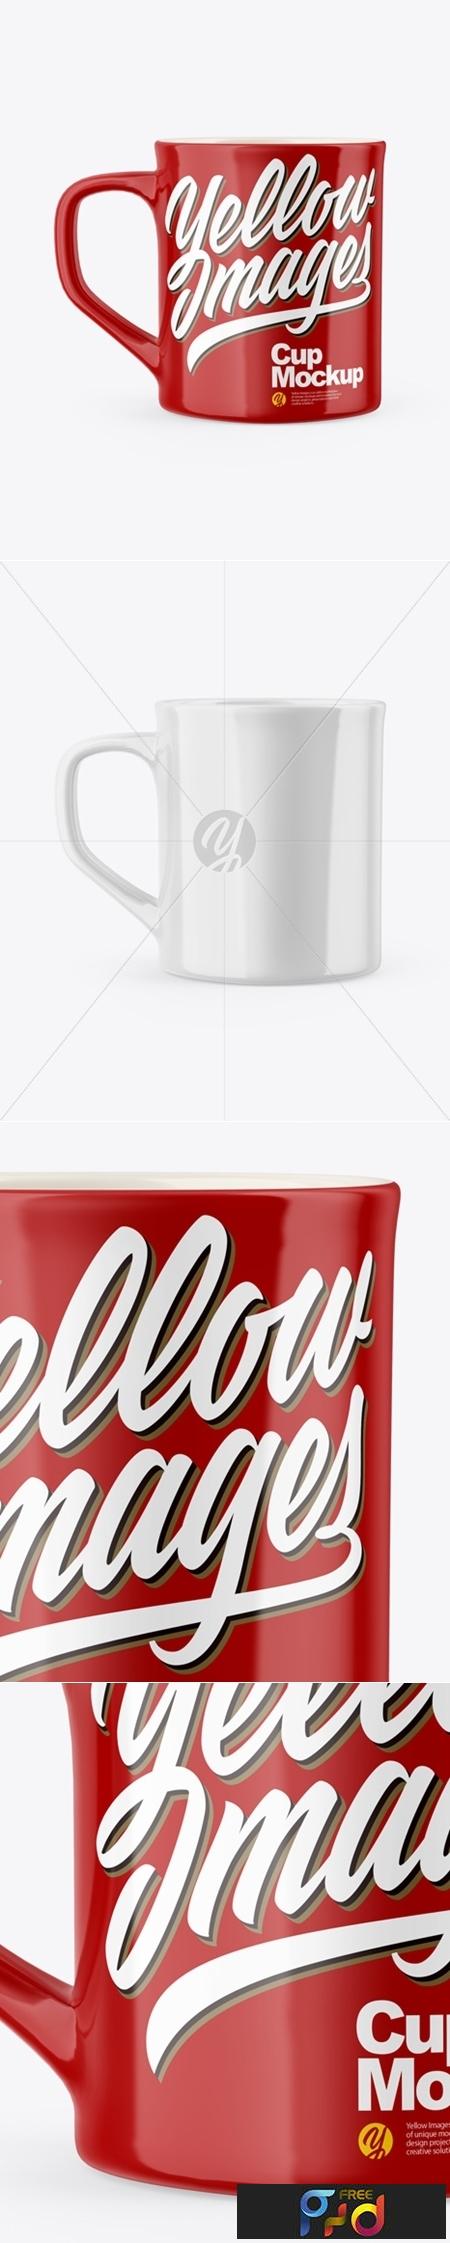 Glossy Cup Mockup 43618 1